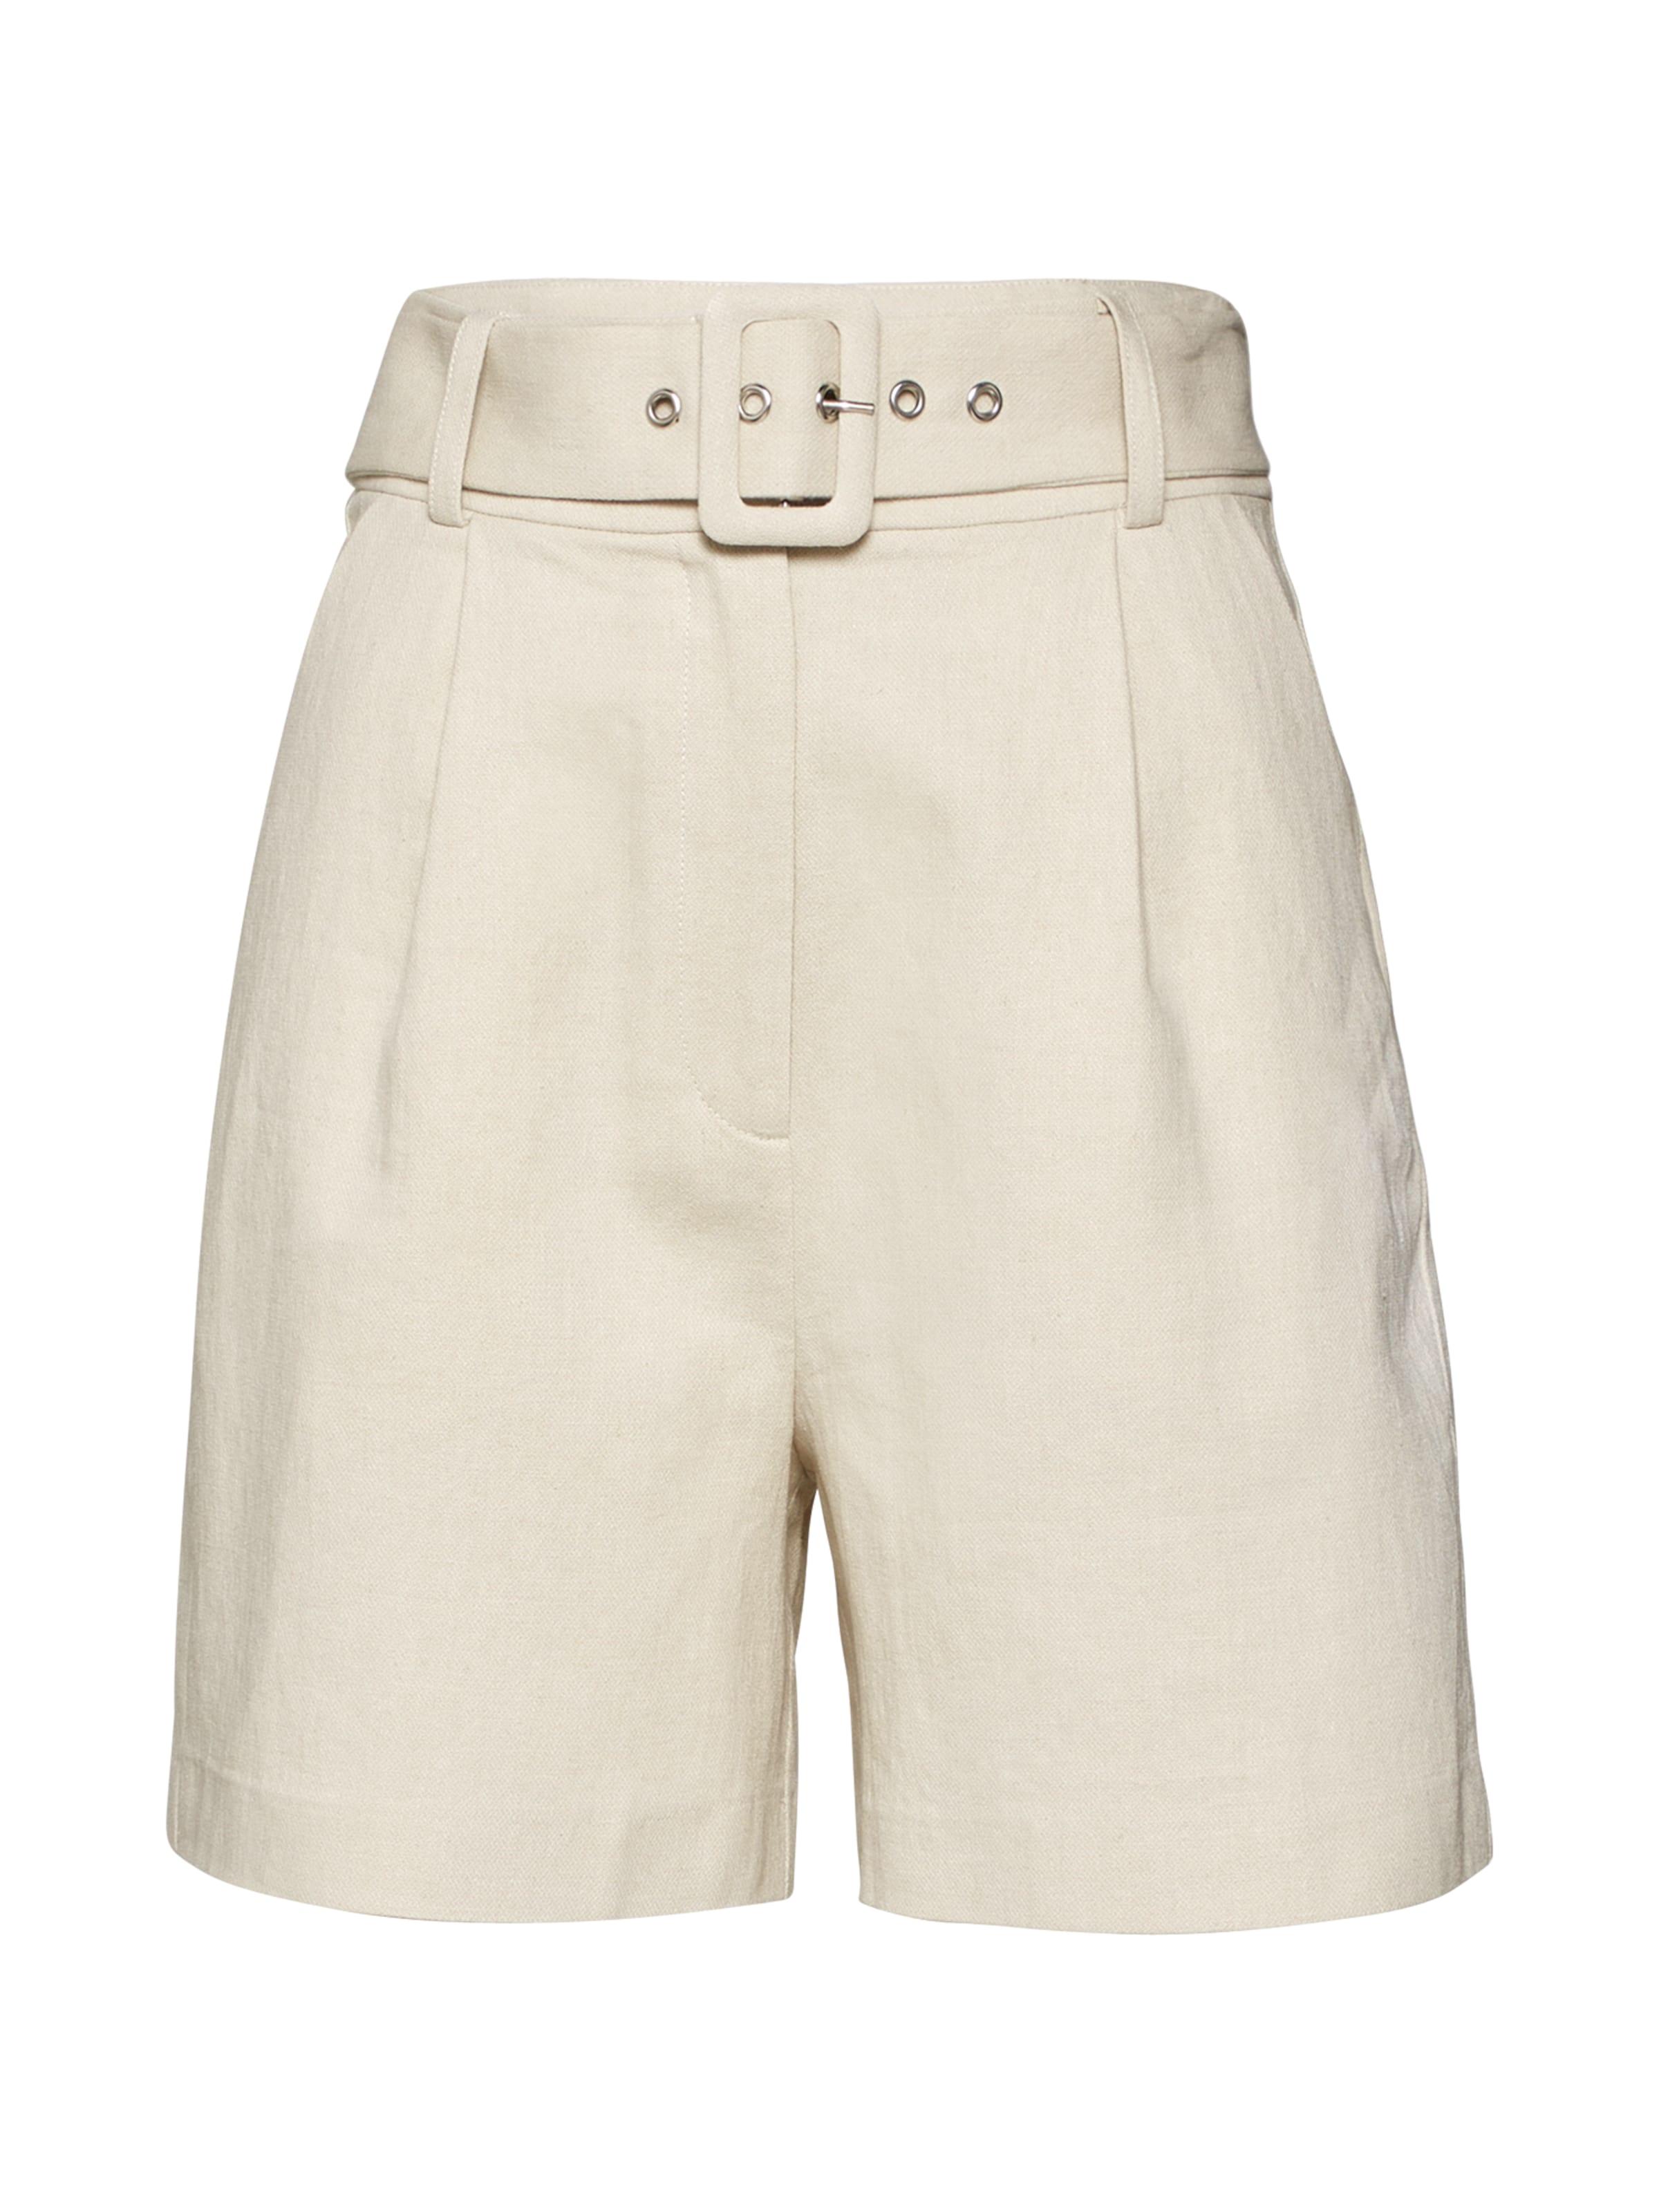 Edited Edited 'faye' 'faye' Hellbeige In Shorts Edited Hellbeige 'faye' Shorts Shorts In In hrQsCxdt